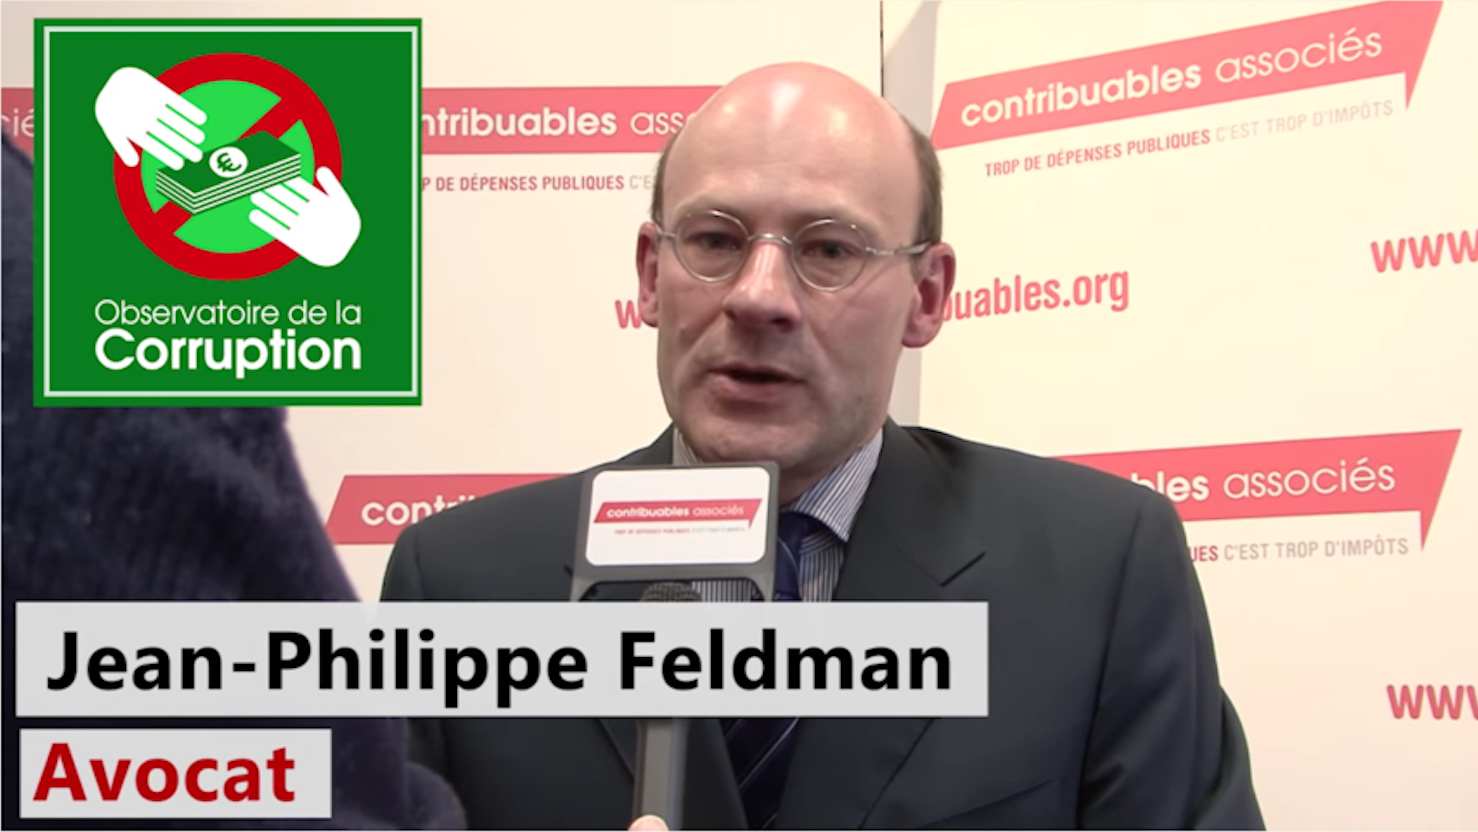 Jean Philippe Feldman